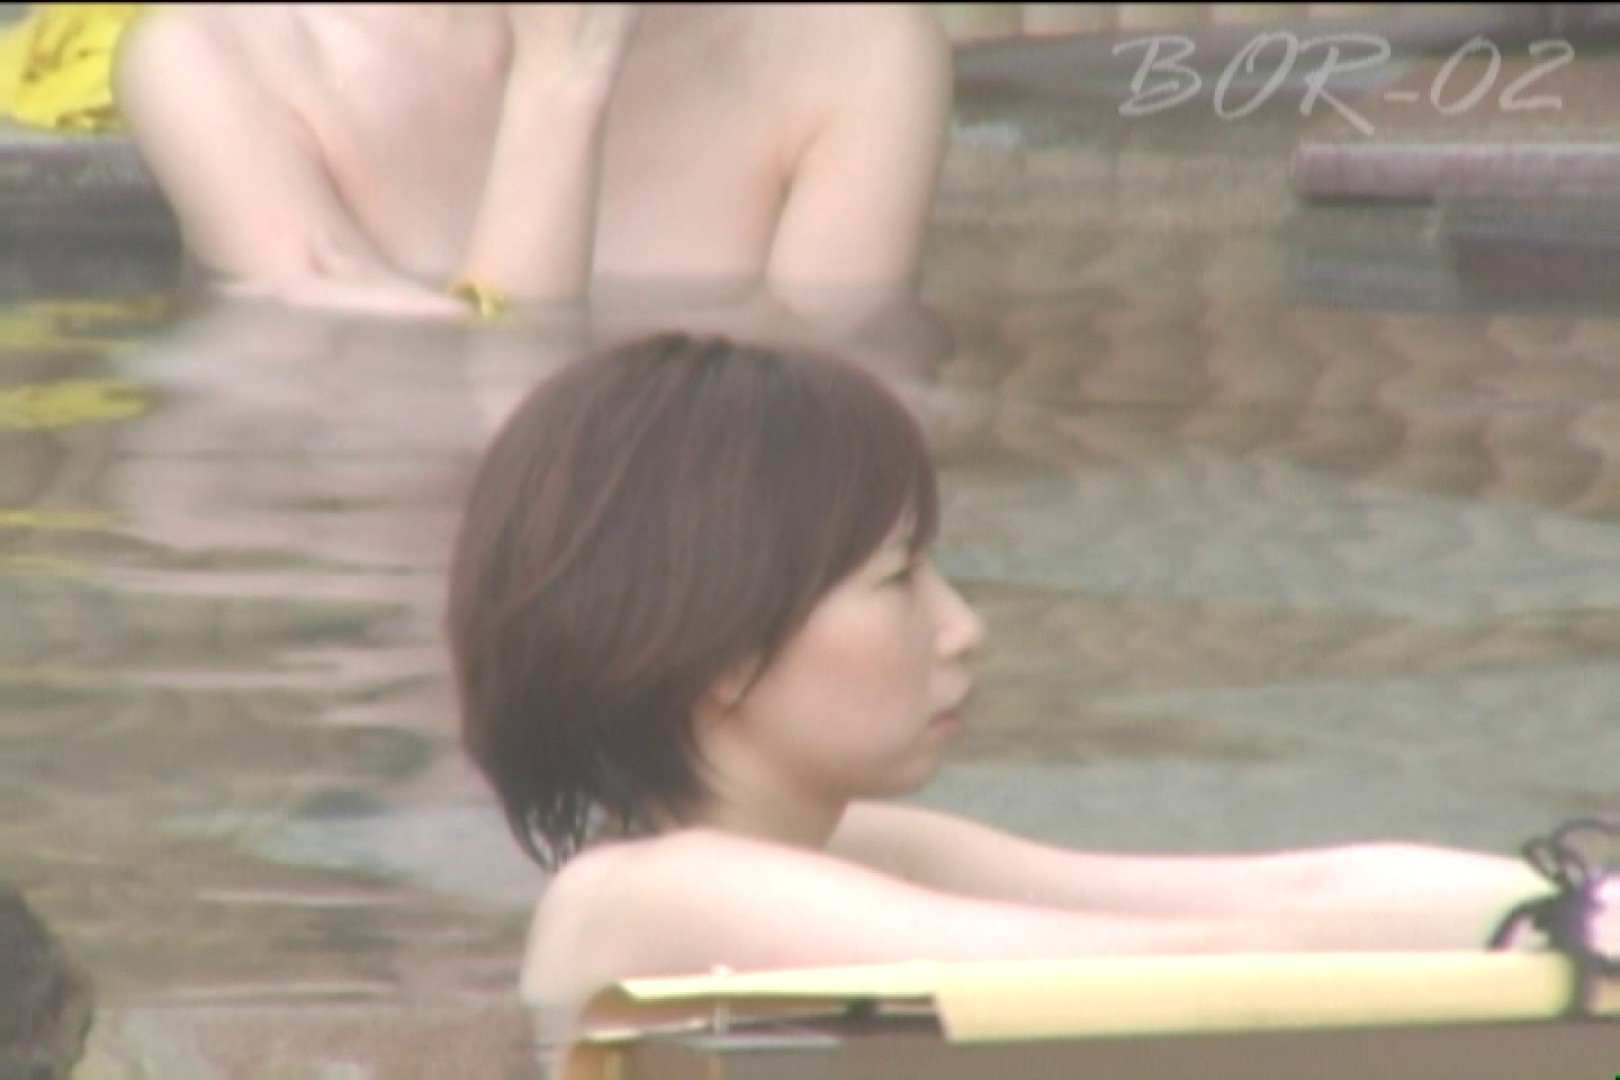 Aquaな露天風呂Vol.476 盗撮師作品 オマンコ無修正動画無料 85pic 44